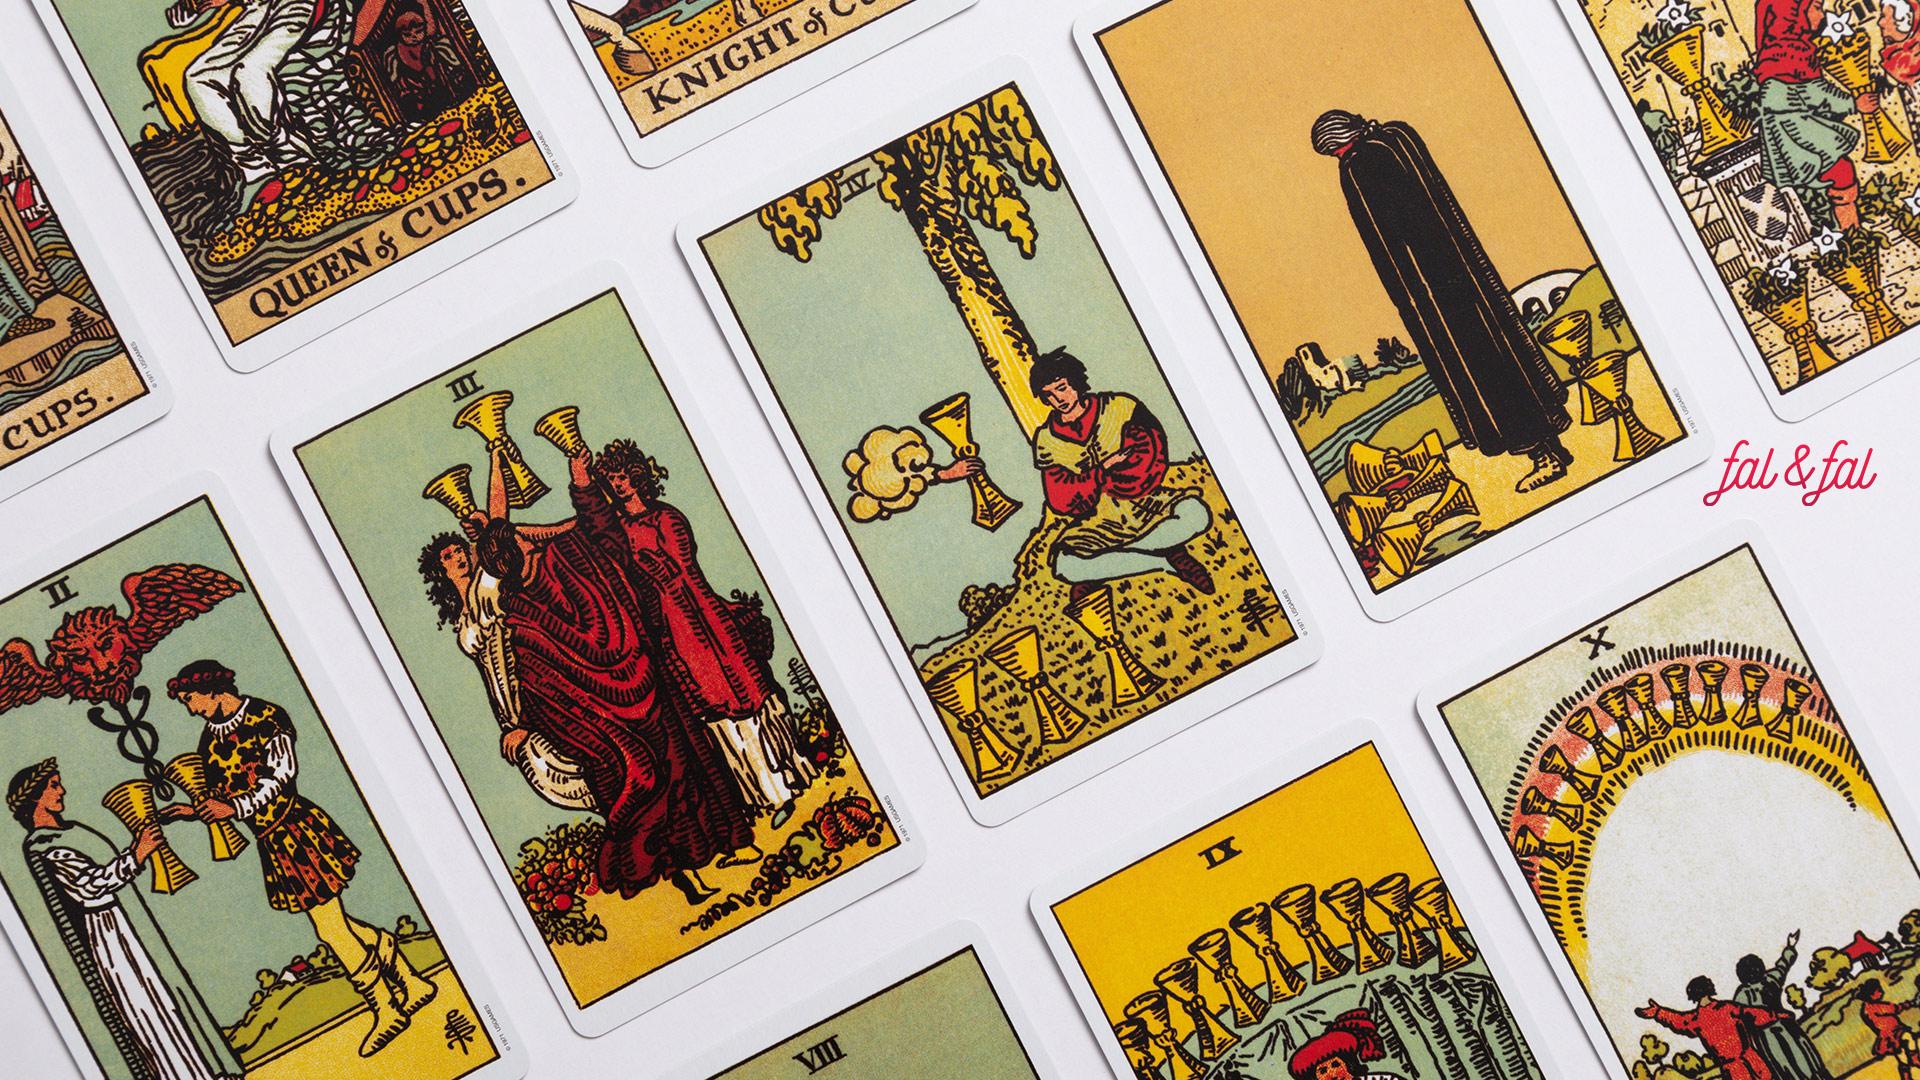 tarot-kartlarinin-temsil-ettigi-burclar